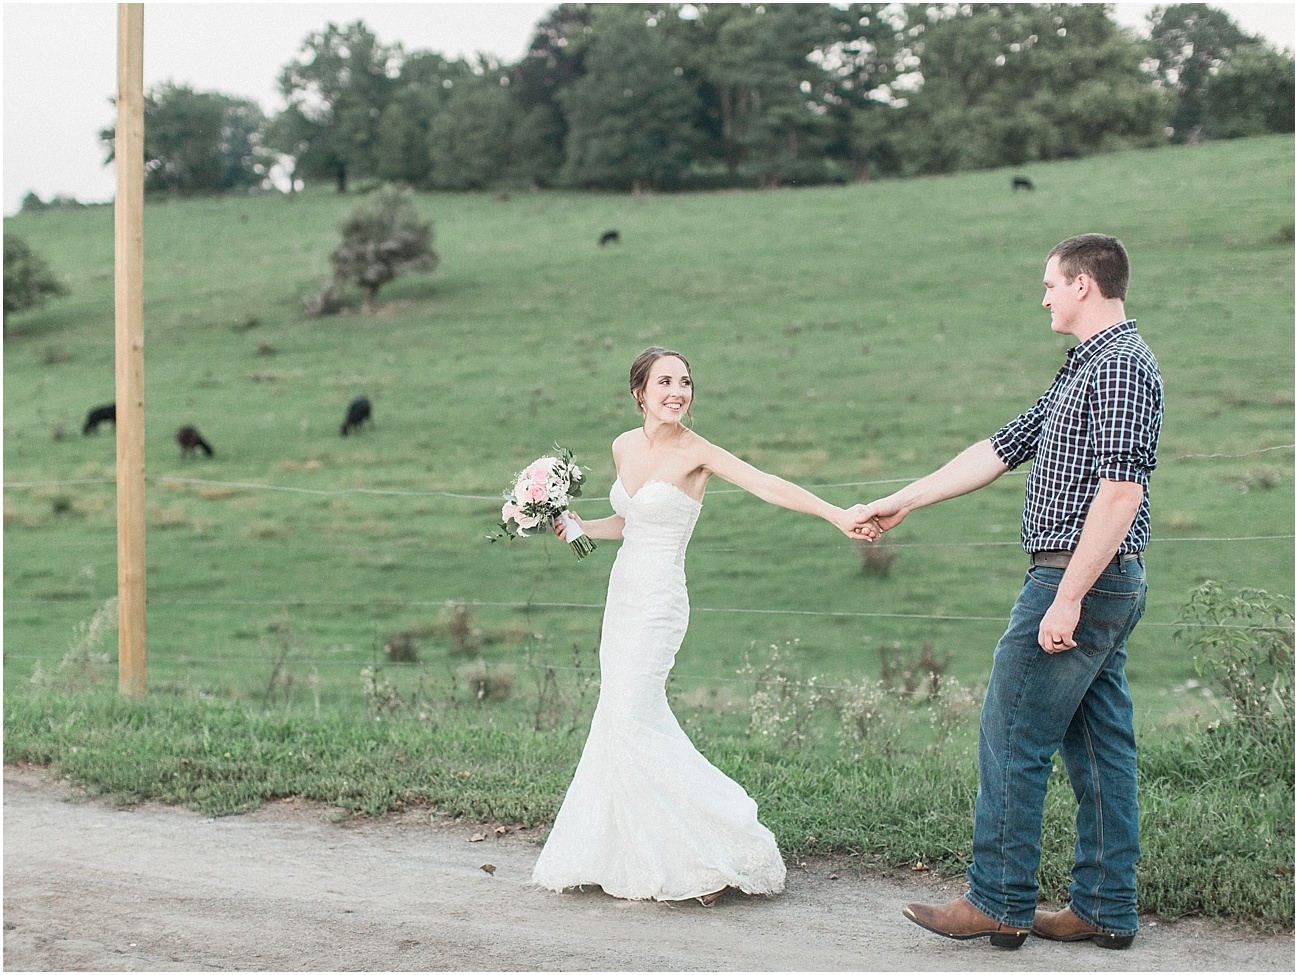 jackie_brad_barn_at_gibbett_hill_country_yellow_lab_fall_burgundy_cape_cod_boston_wedding_photographer_meredith_jane_photography_photo_1056.jpg